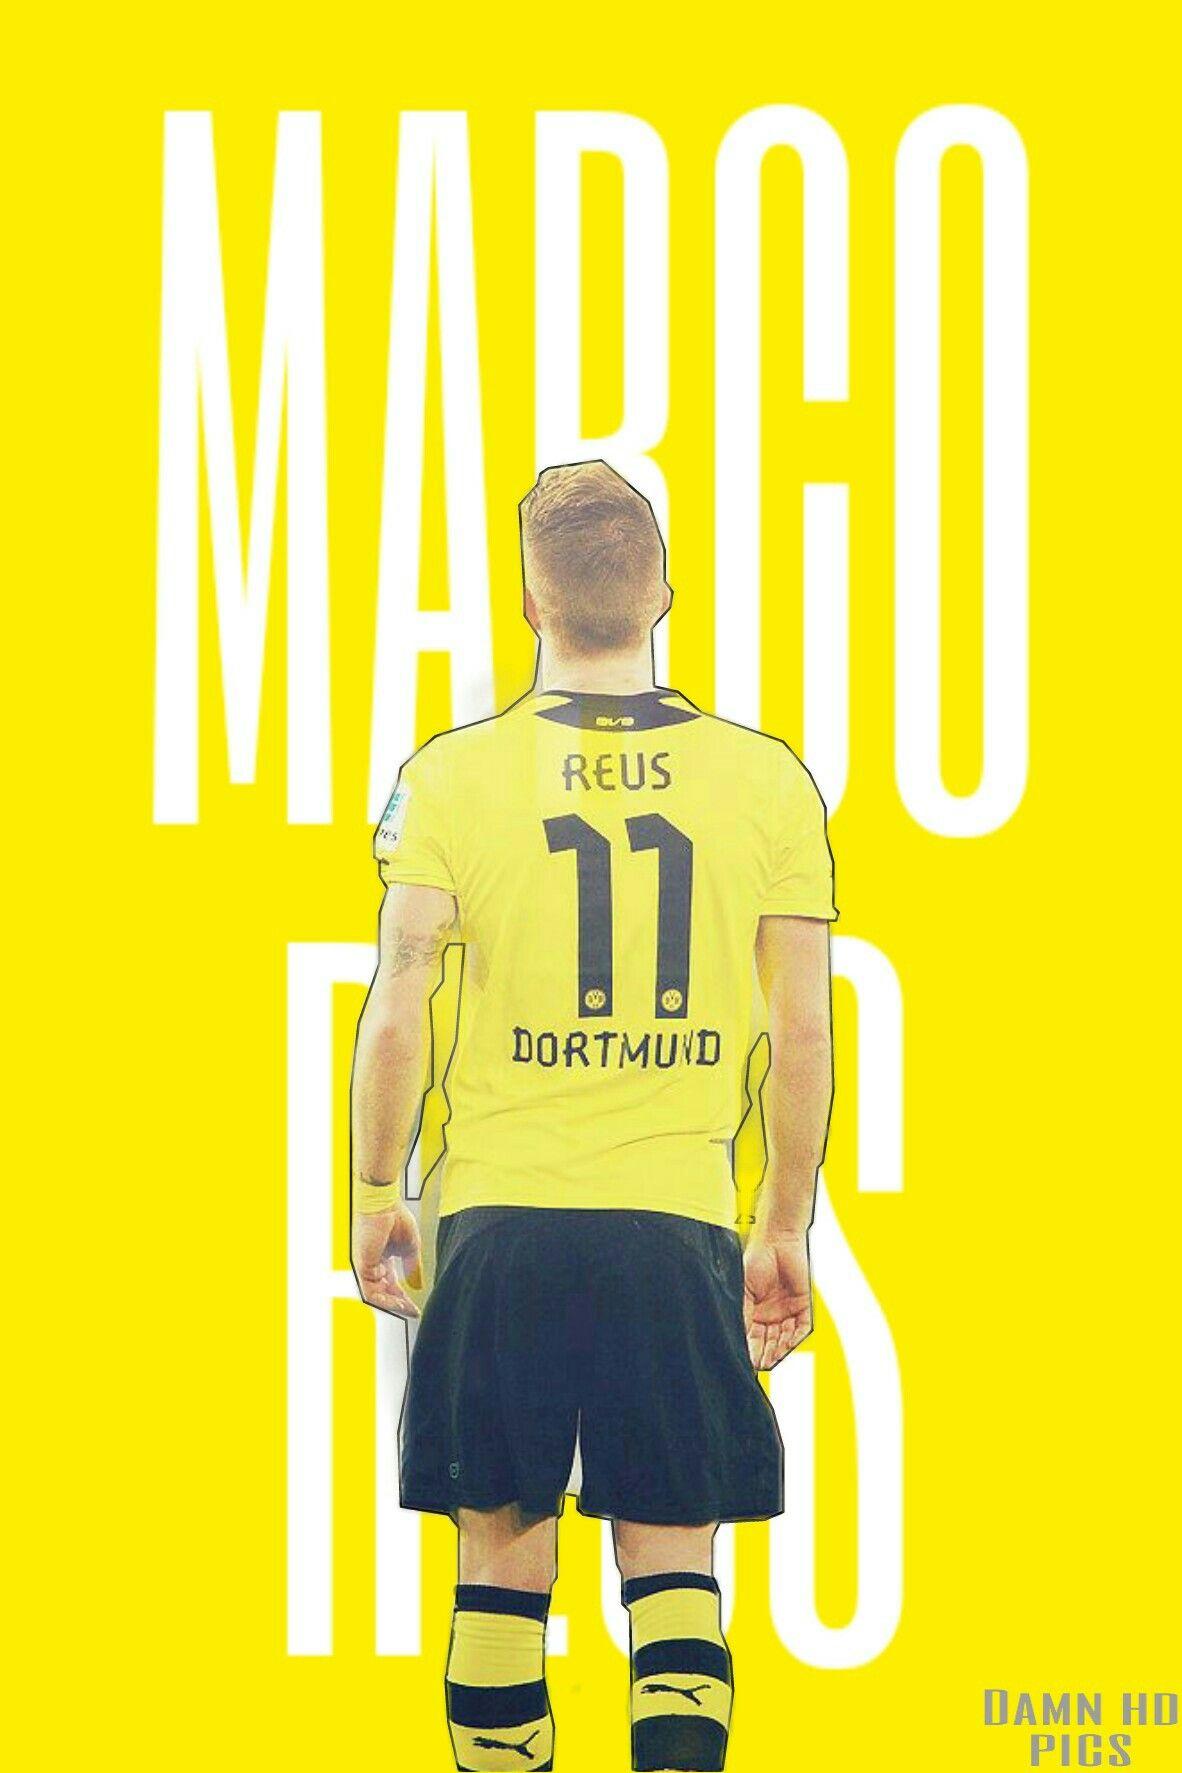 Marco Reus Bvb Dortmund Borussia Dortmund Bvb